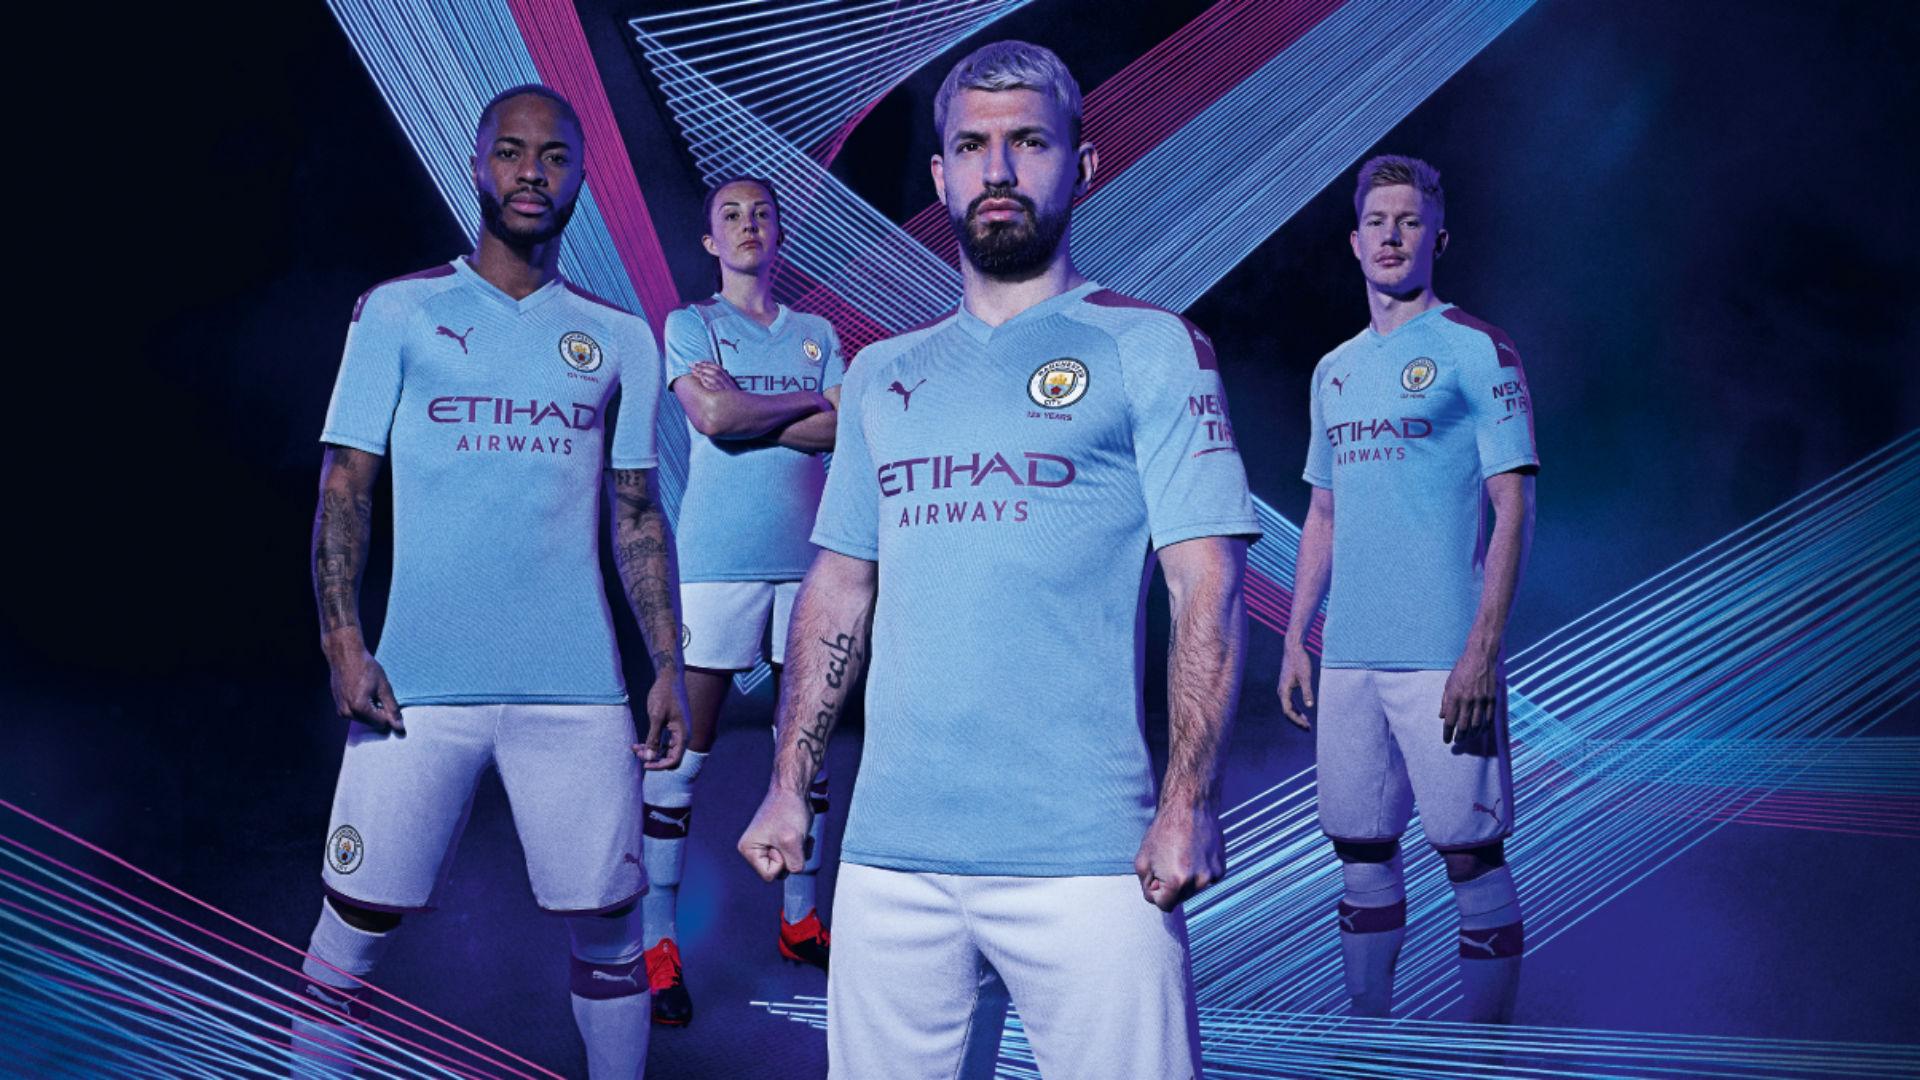 Man City Kits 2019 20 Treble Winners Reveal 125 Year